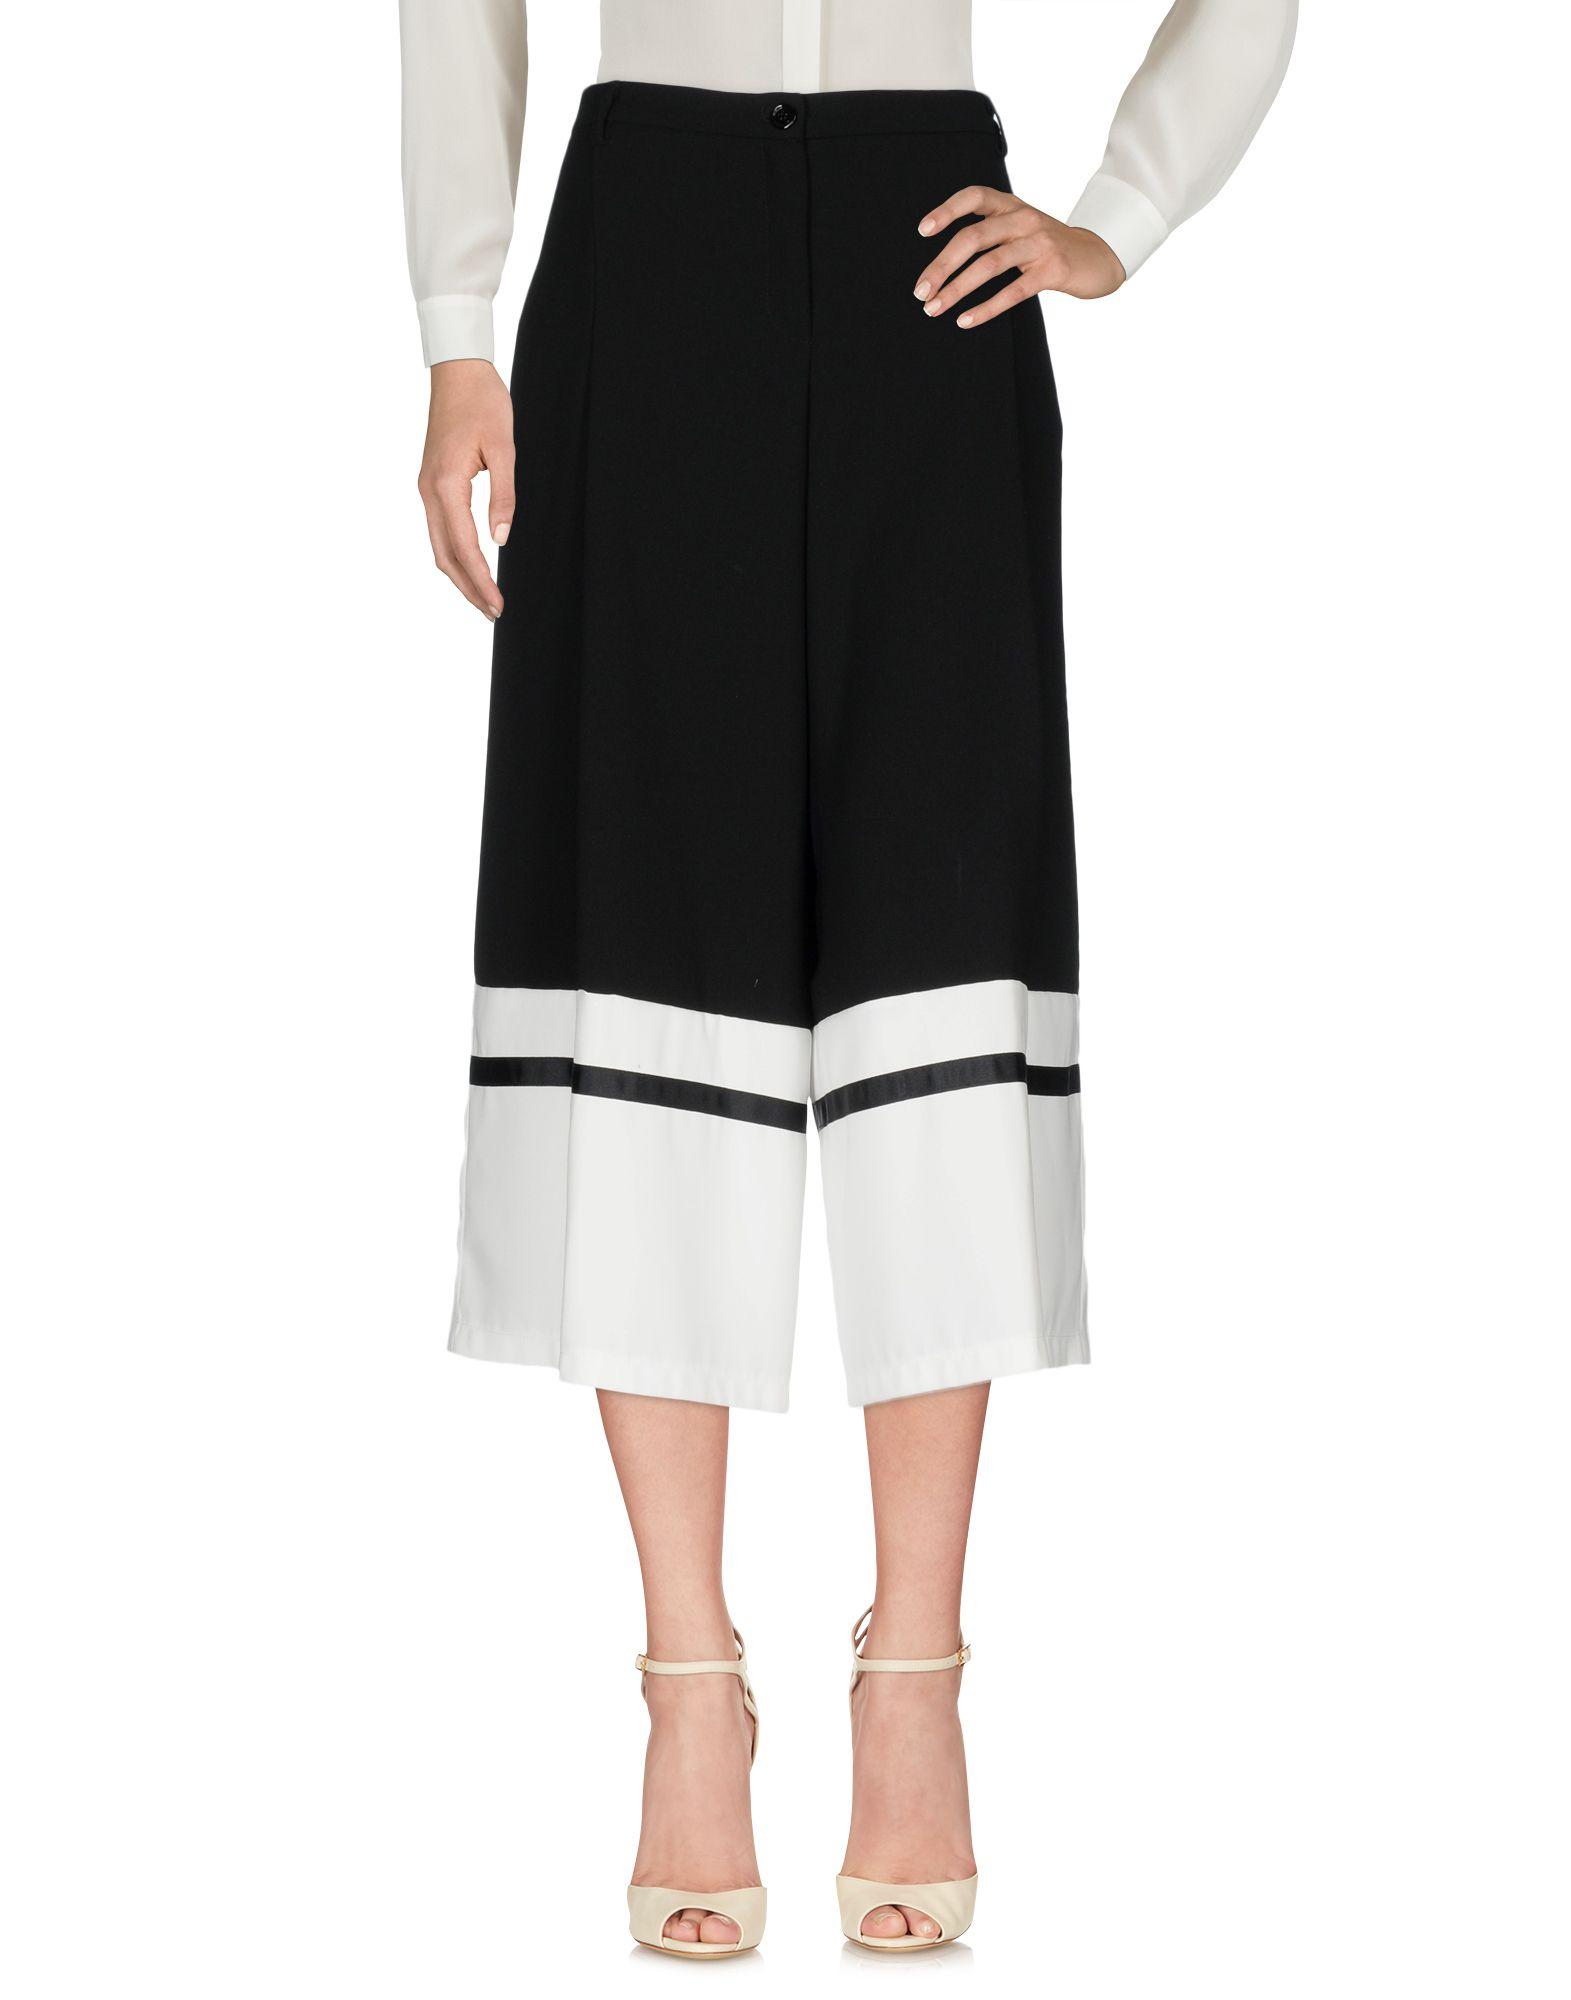 CRISTINA GAVIOLI COLLECTION Брюки-капри платье cristina gavioli платья и сарафаны мини короткие